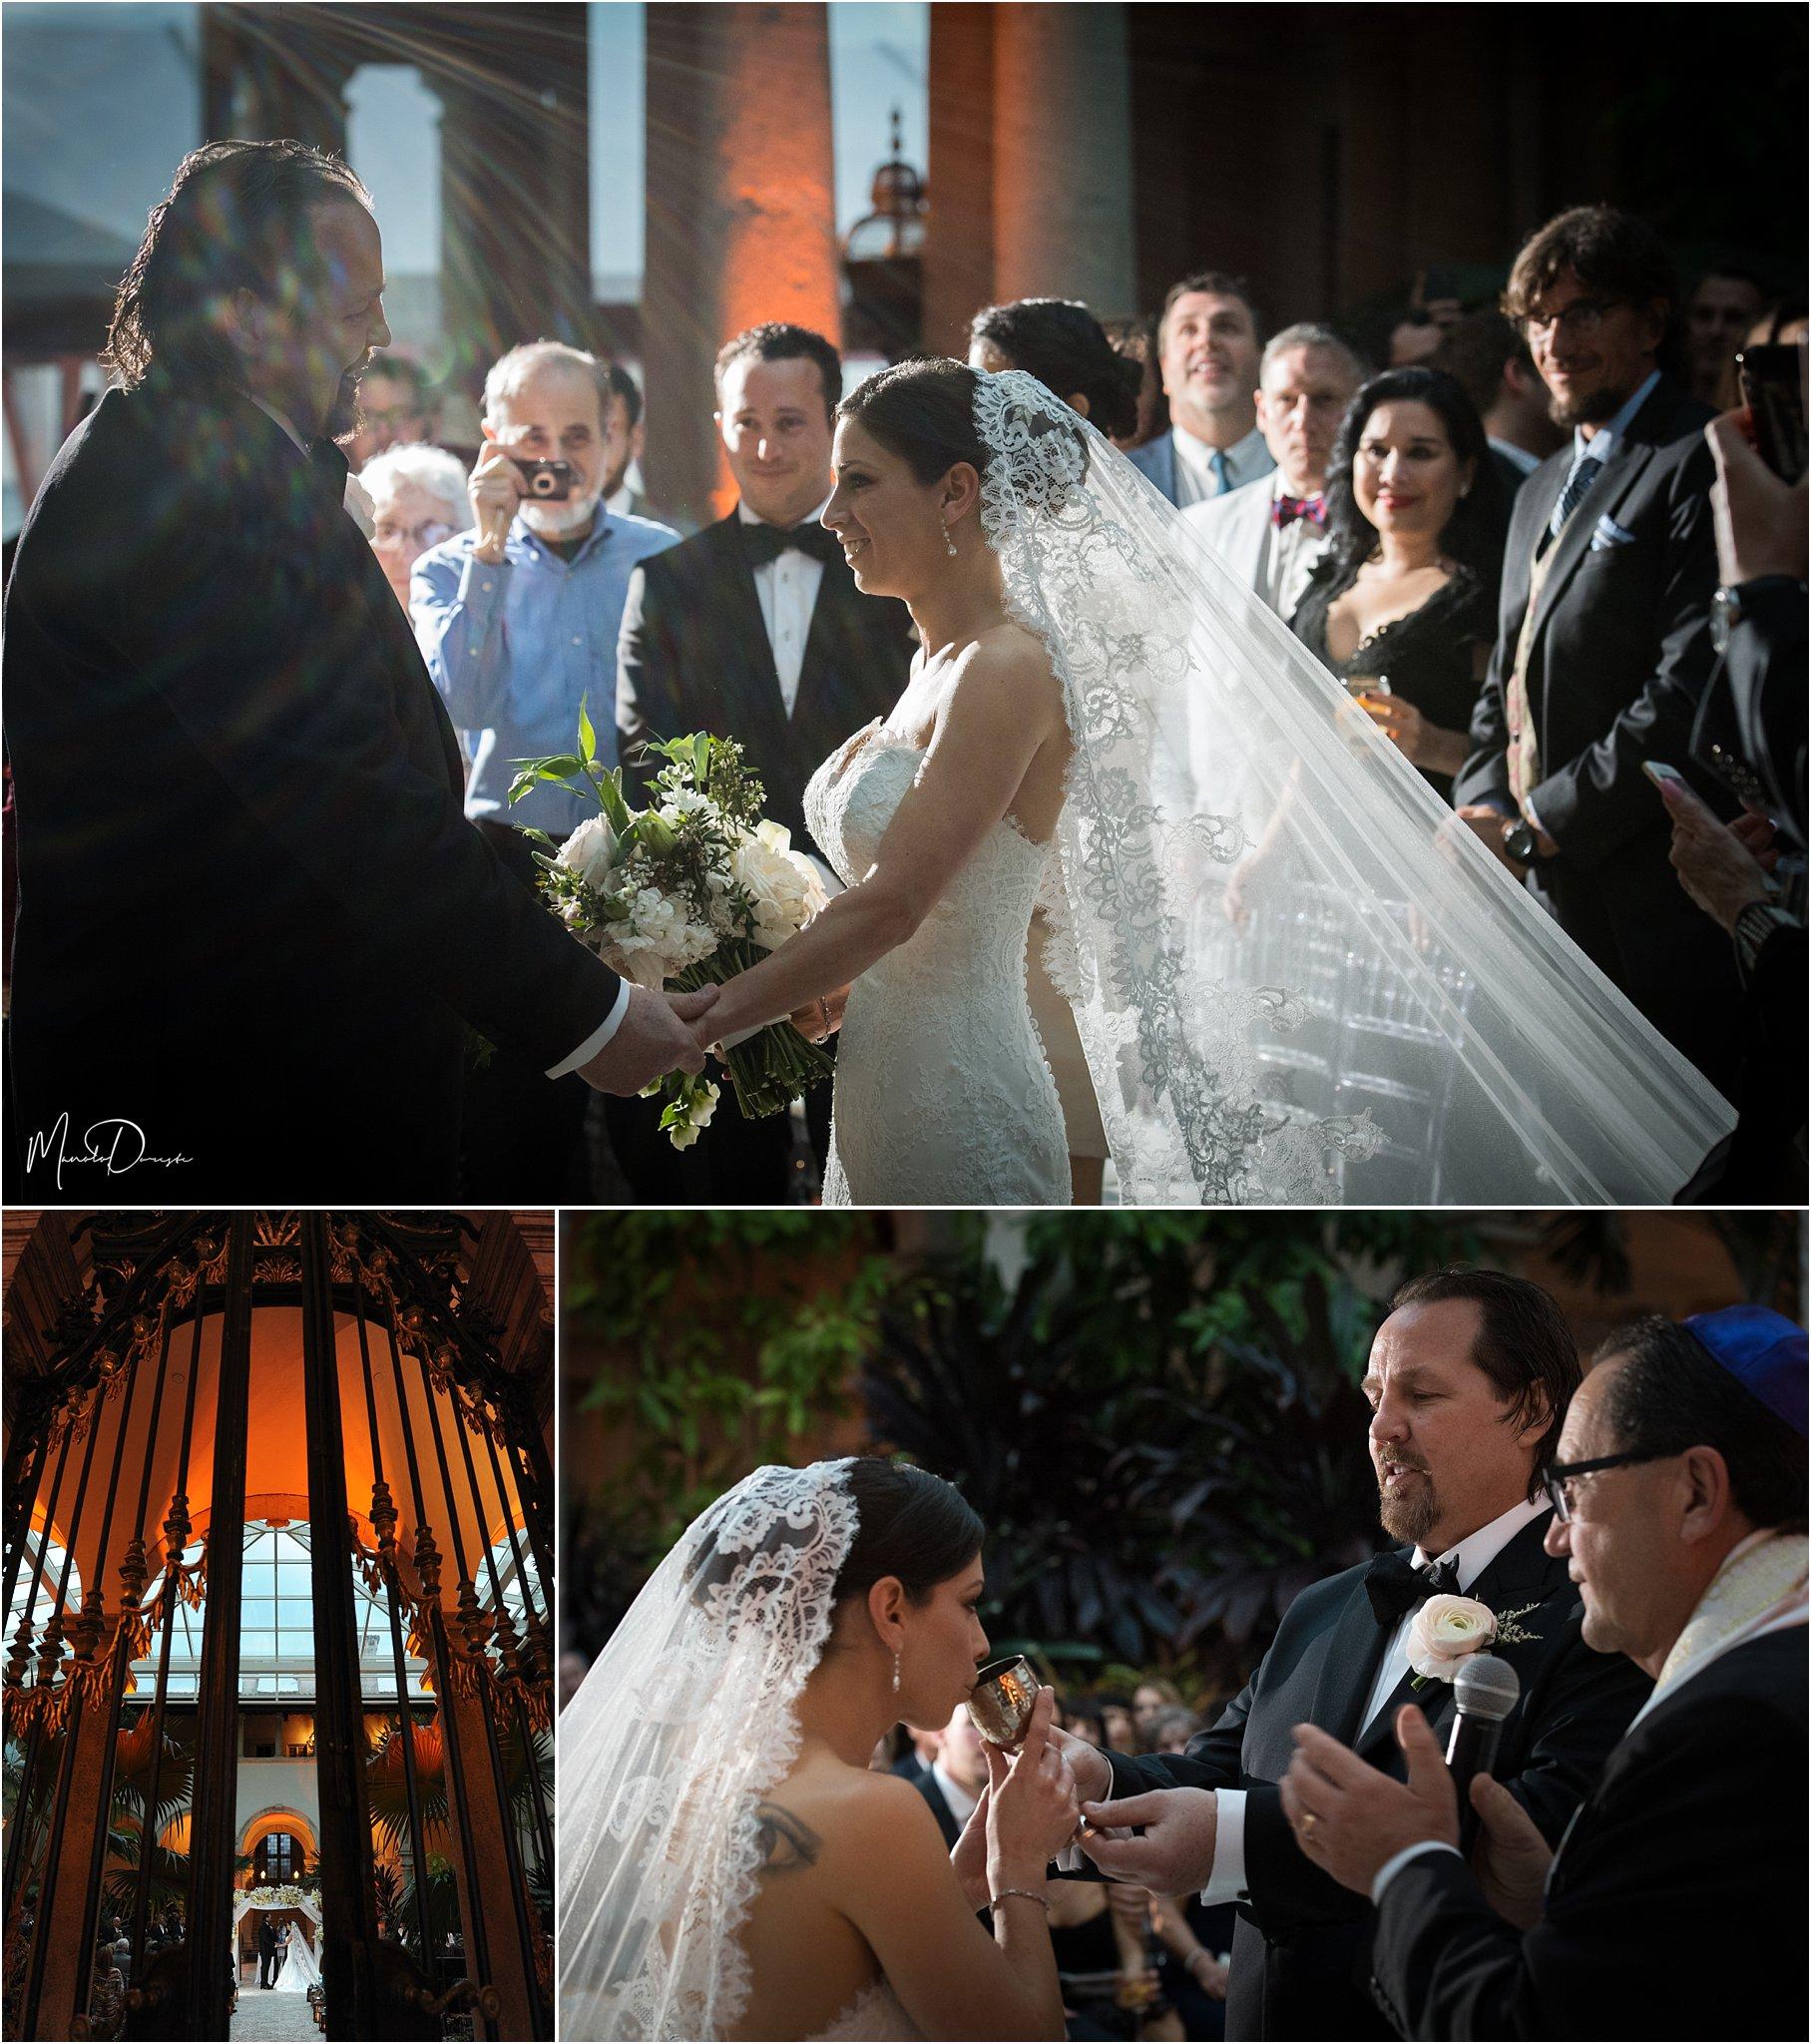 00757_ManoloDoreste_InFocusStudios_Wedding_Family_Photography_Miami_MiamiPhotographer.jpg